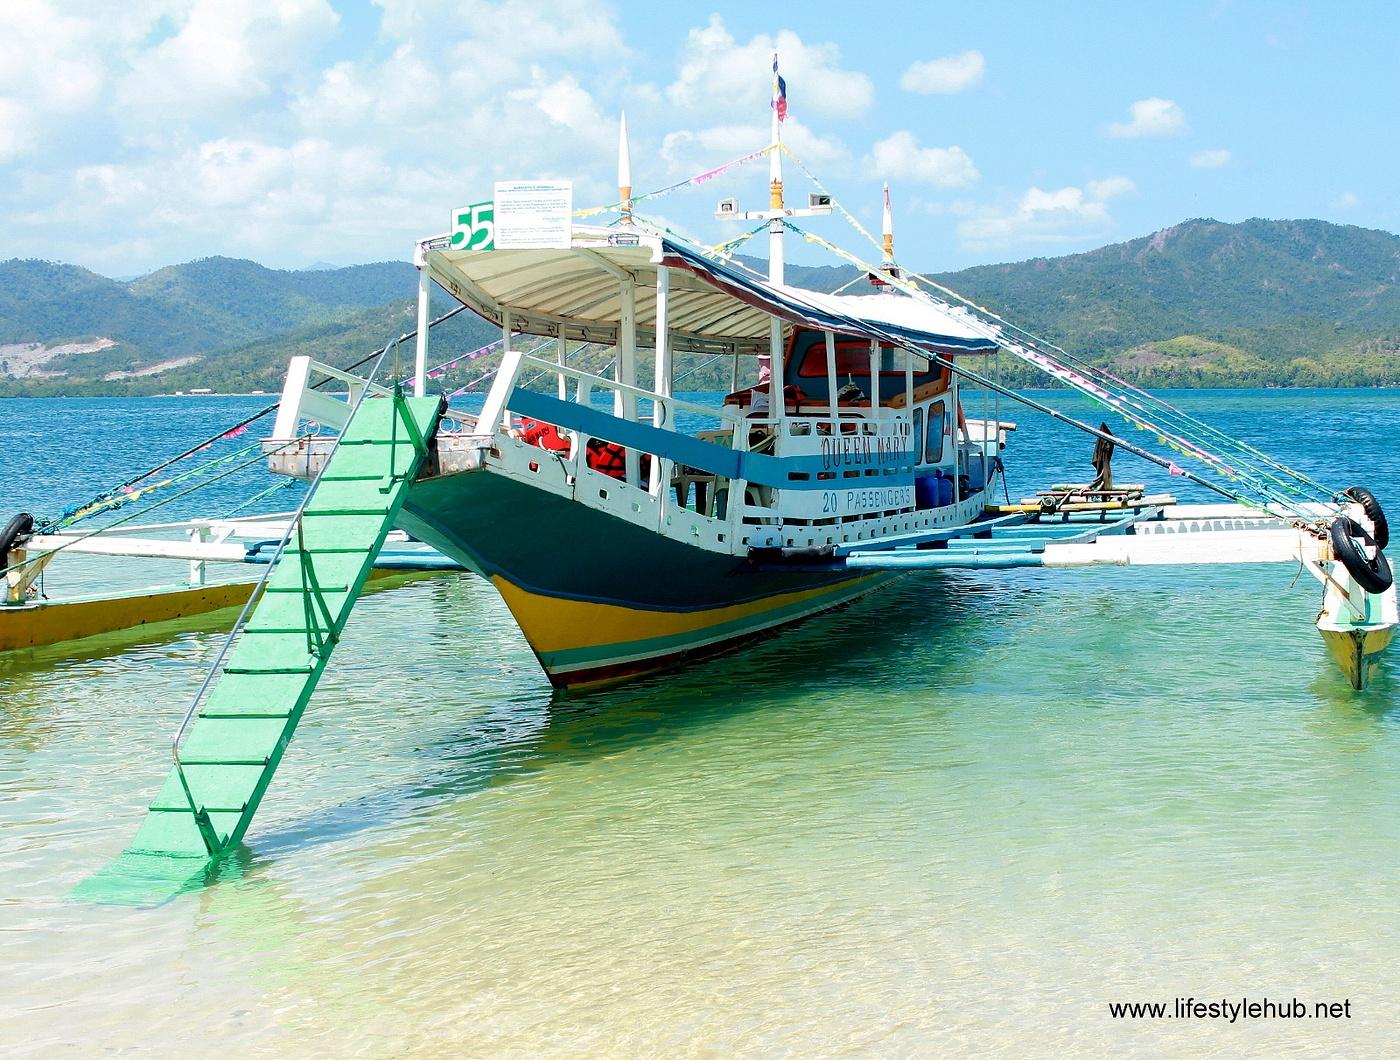 honda bay puerto princesa palawan photos